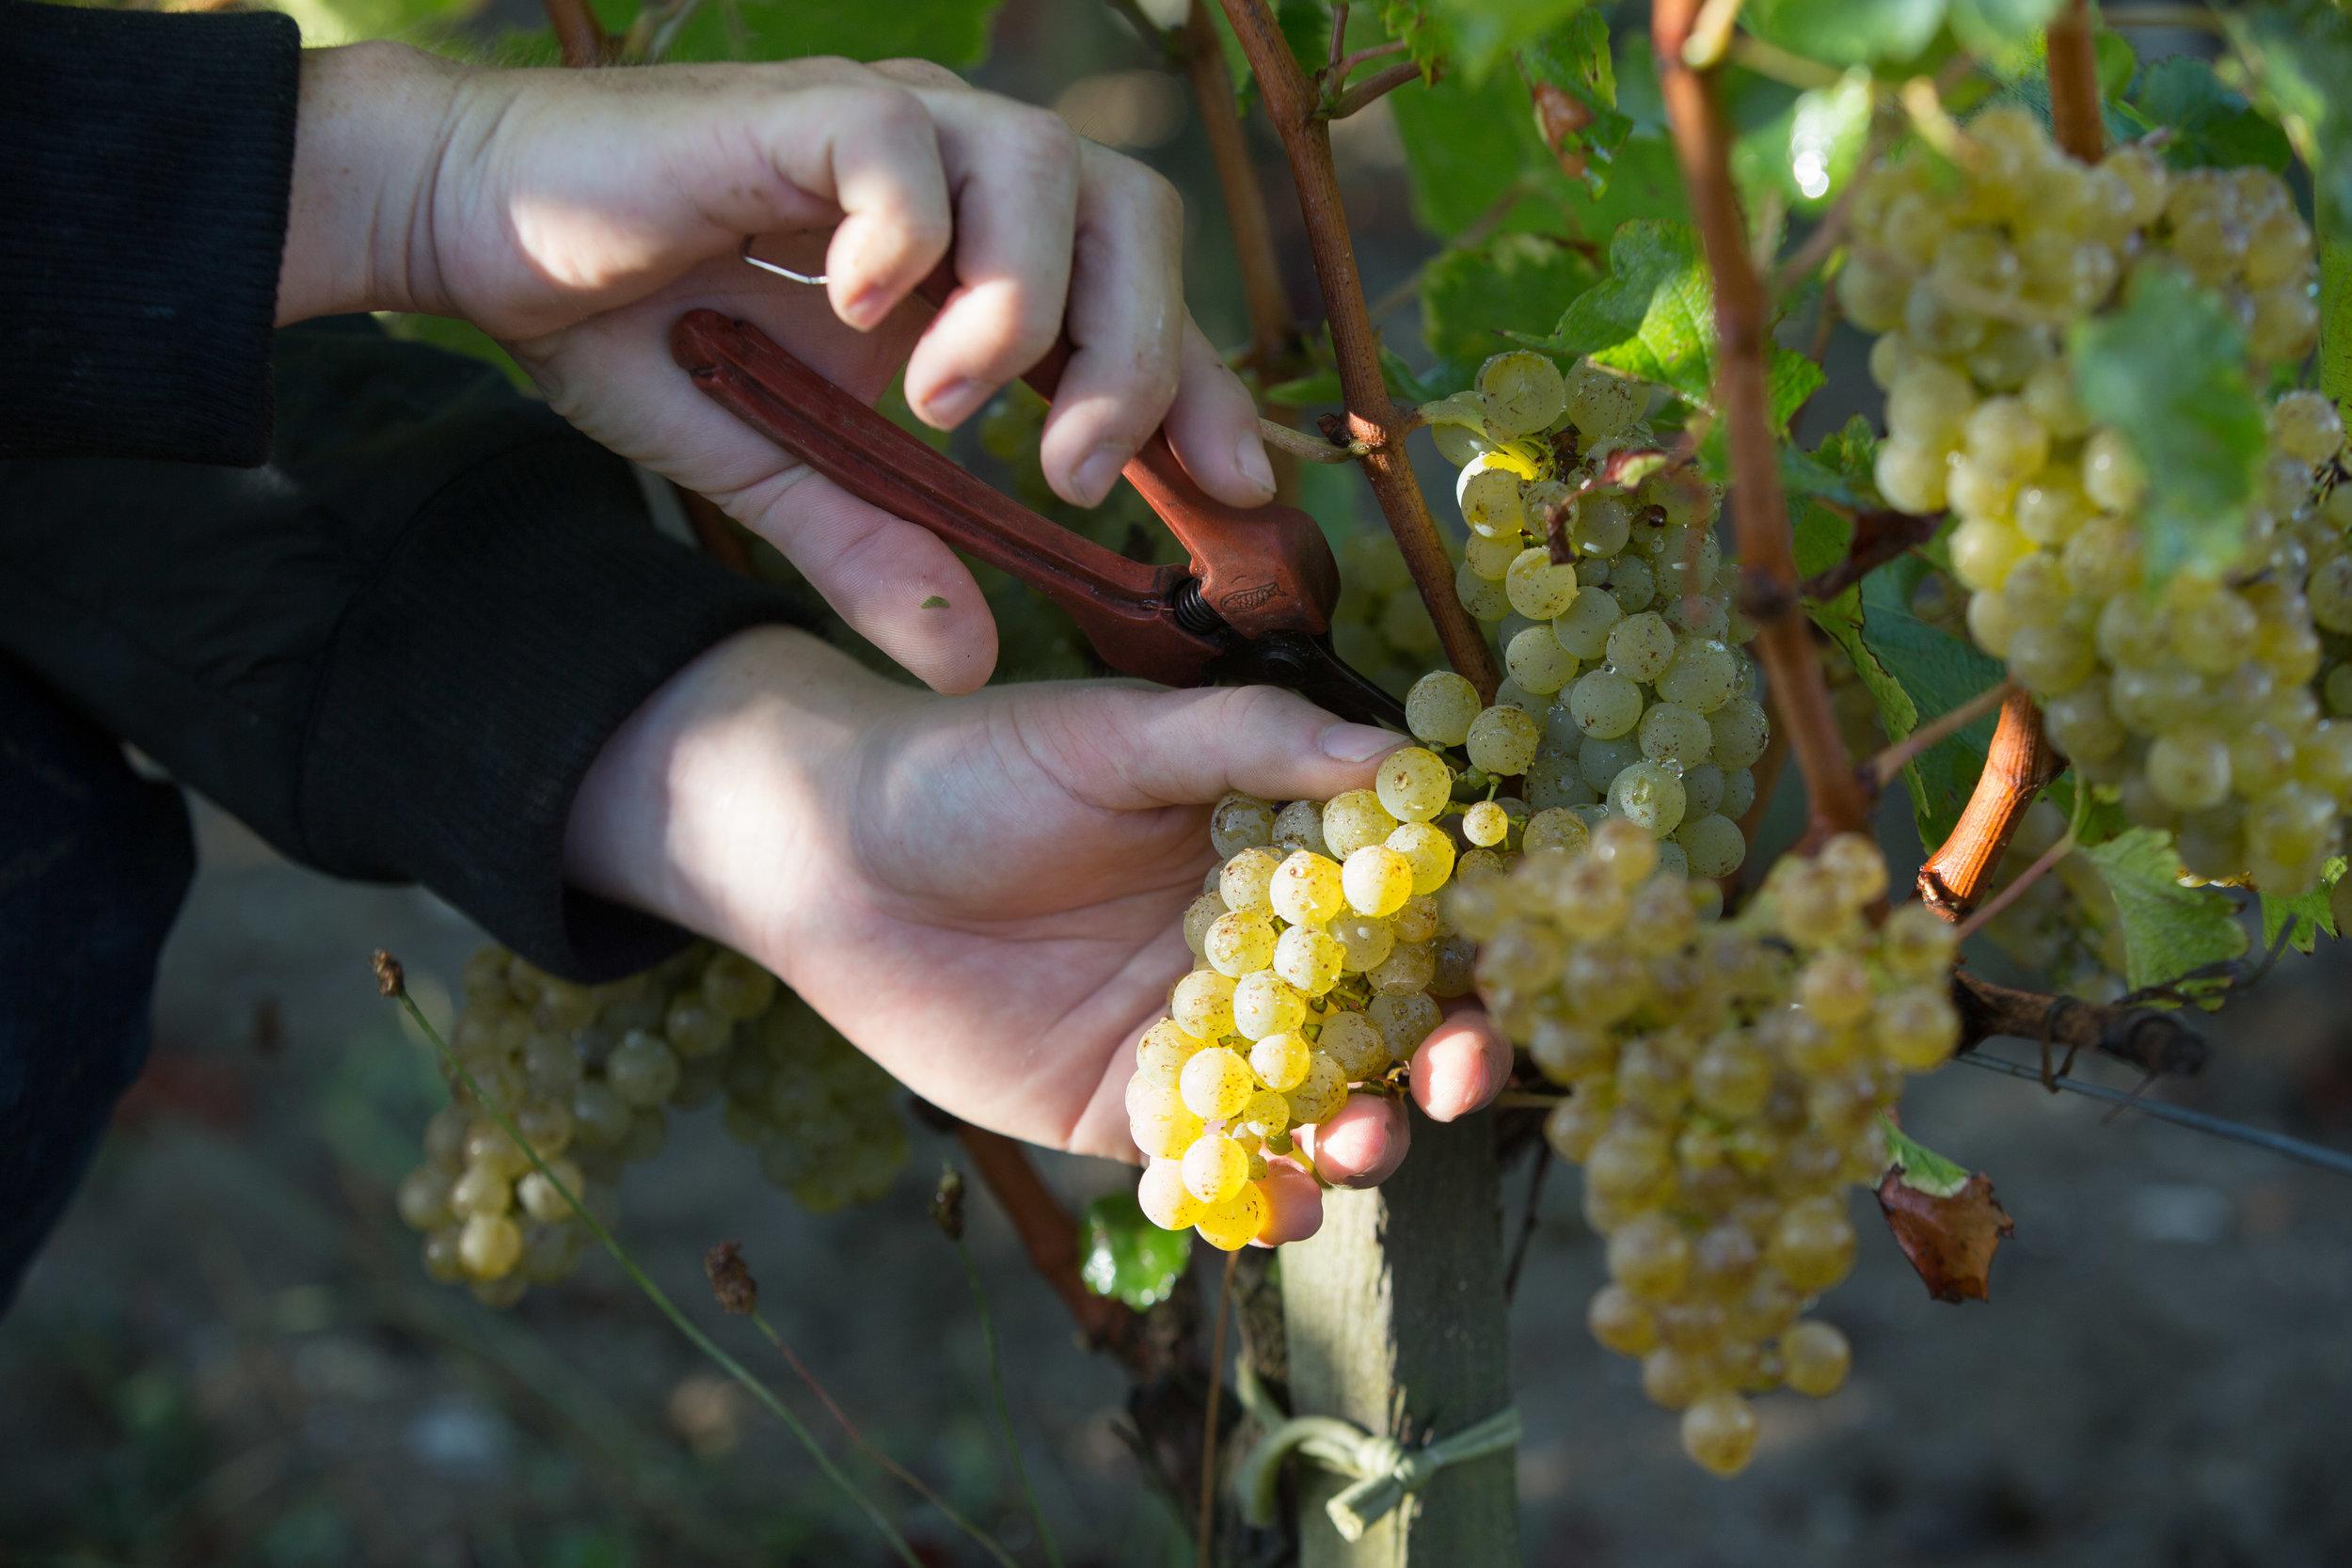 Harvest at Chateau Fourcas Hosten (Image: Chateau source)